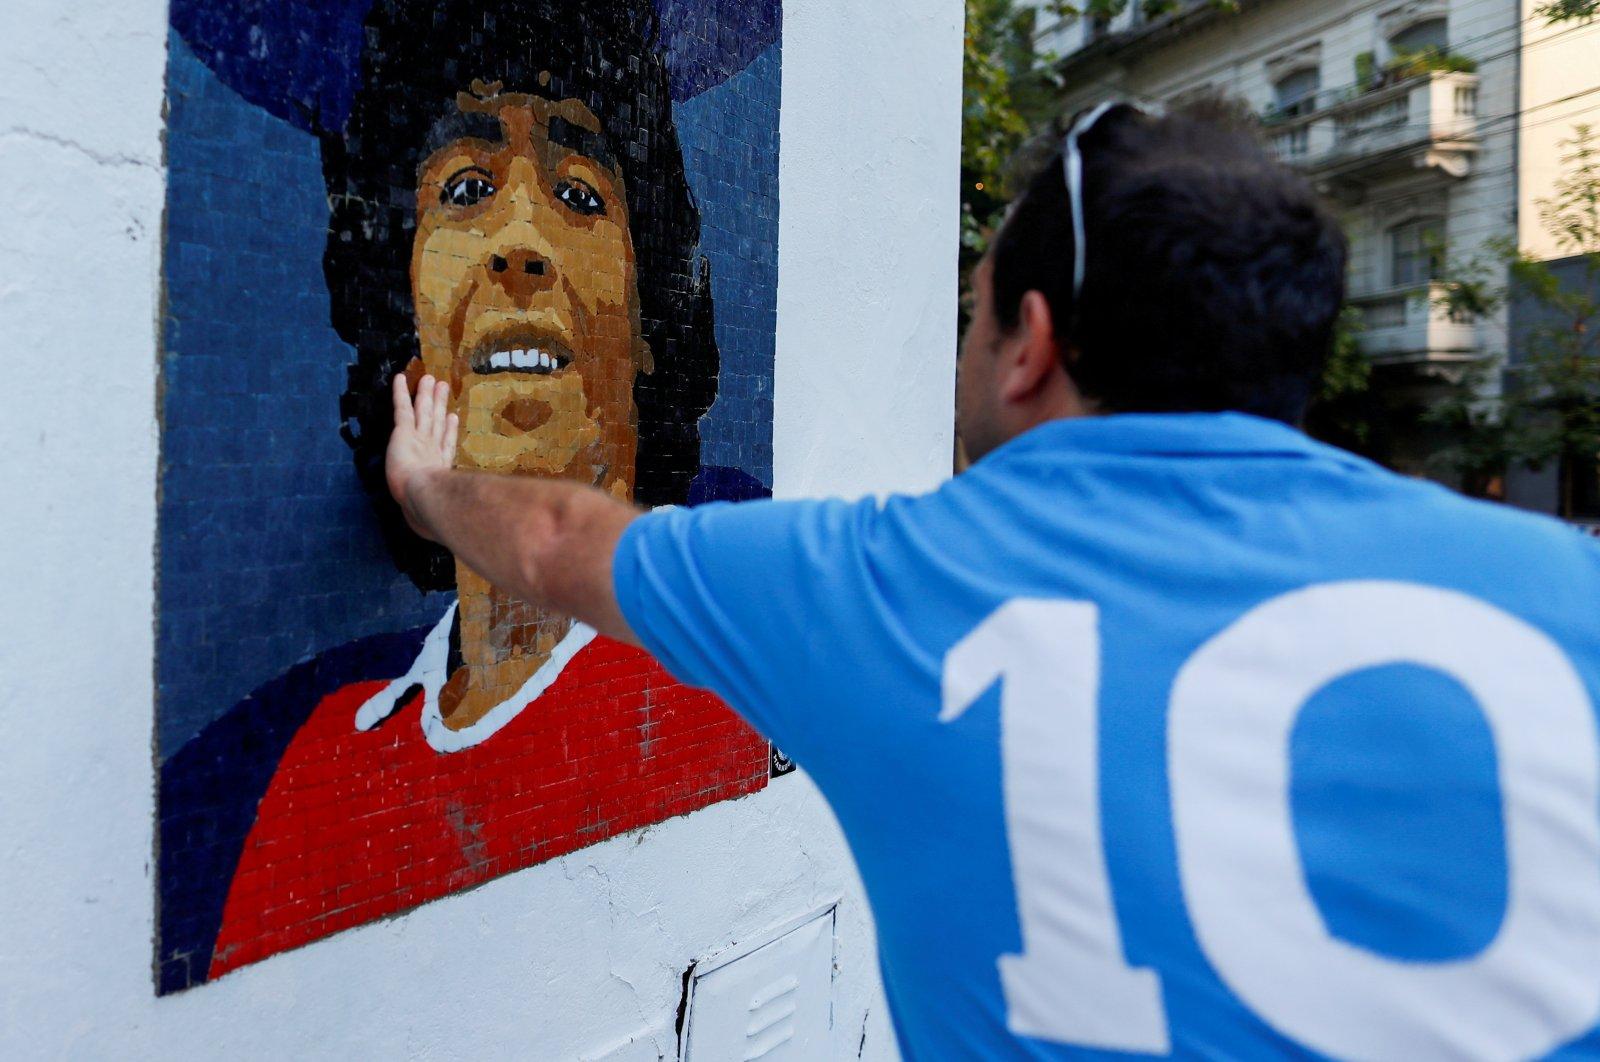 A man touches a mosaic made by the cultural organization Comando Maradona as a homage to late Argentine soccer superstar Diego Armado Maradona, Buenos Aires, Argentina, Feb. 25, 2021. (Reuters Photo)